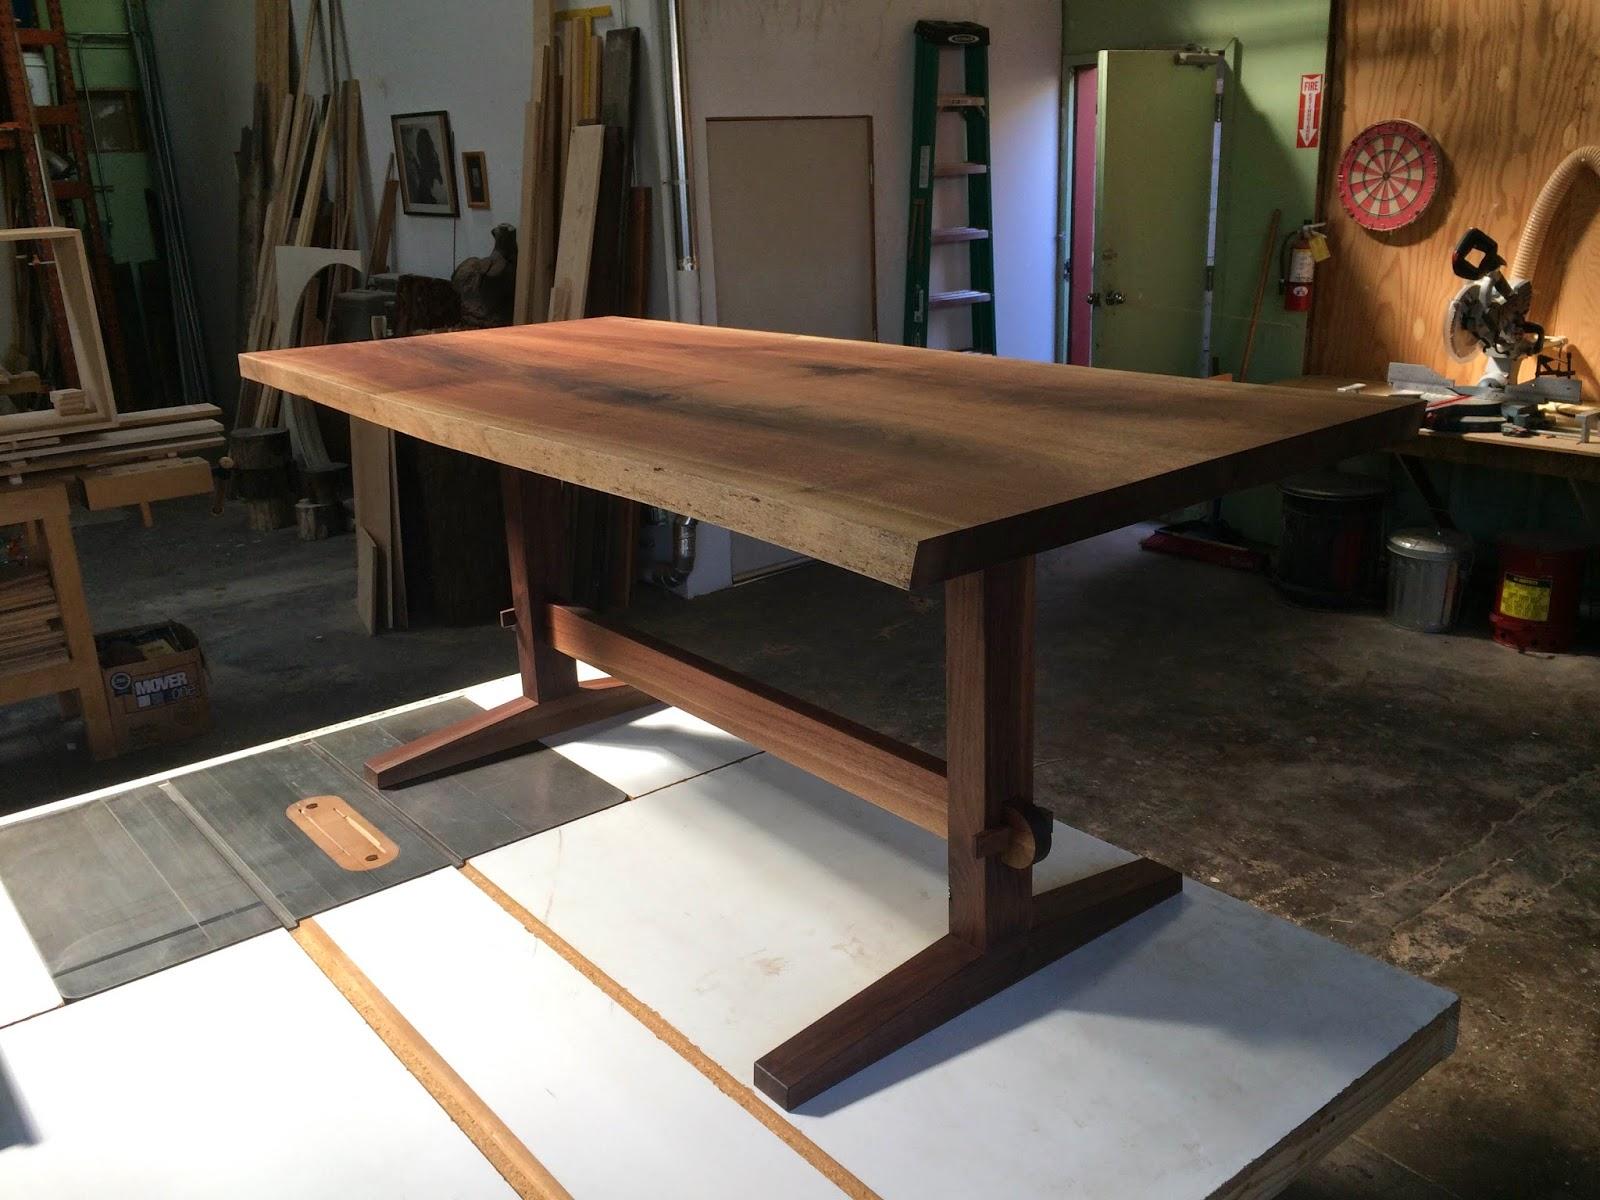 Sebastian Parker: Sculpture And Furniture Design: WALNUT